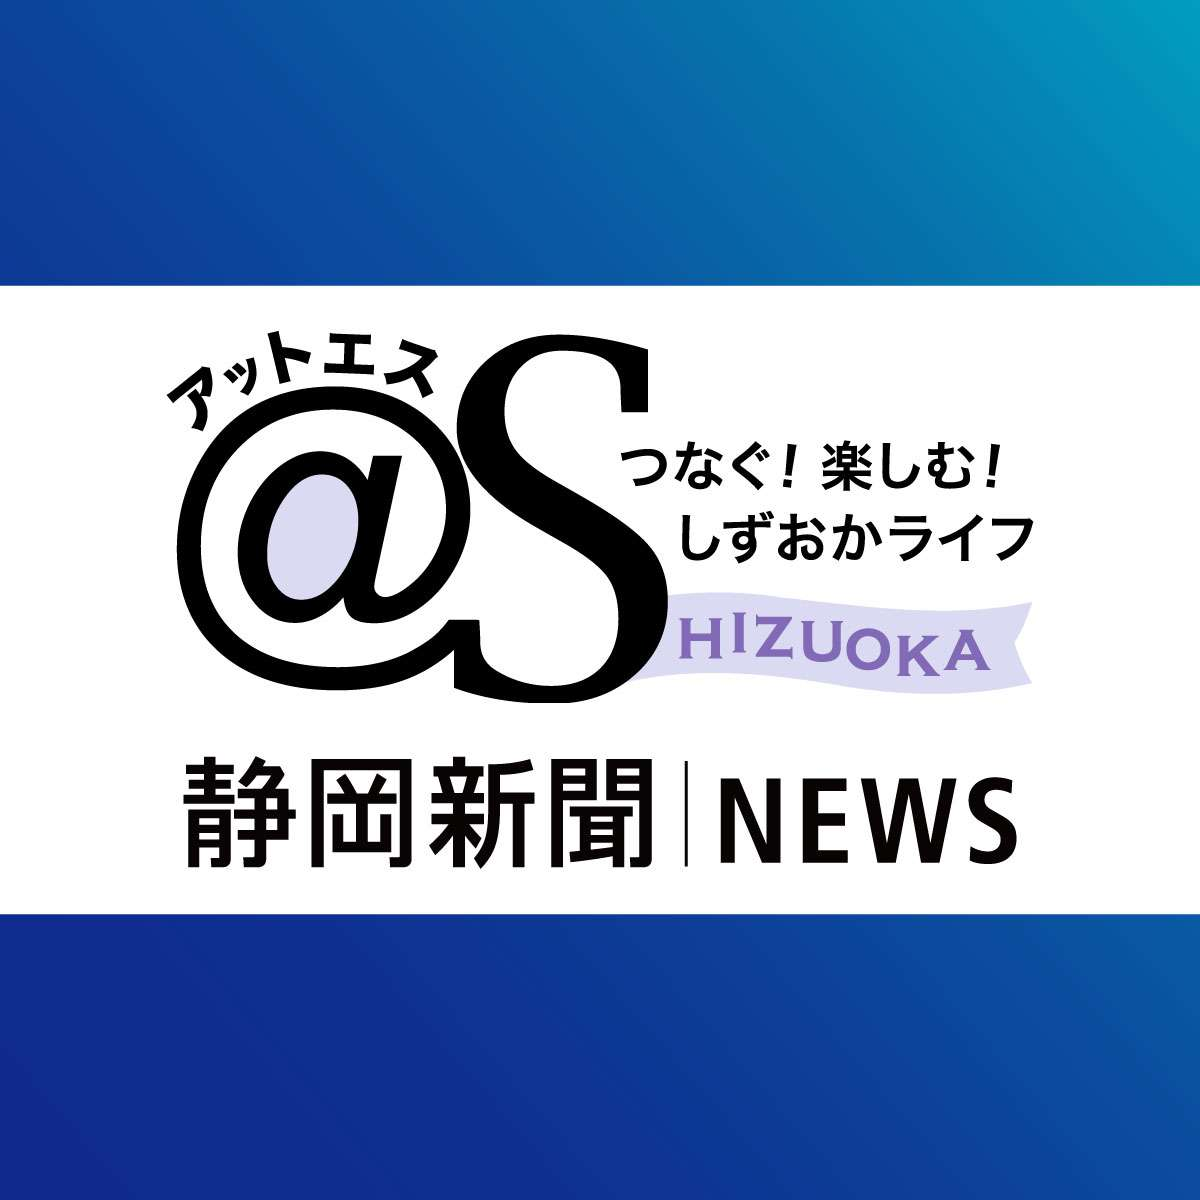 「DNA鑑定で人権侵害」 日弁連、静岡県警に勧告|静岡新聞アットエス